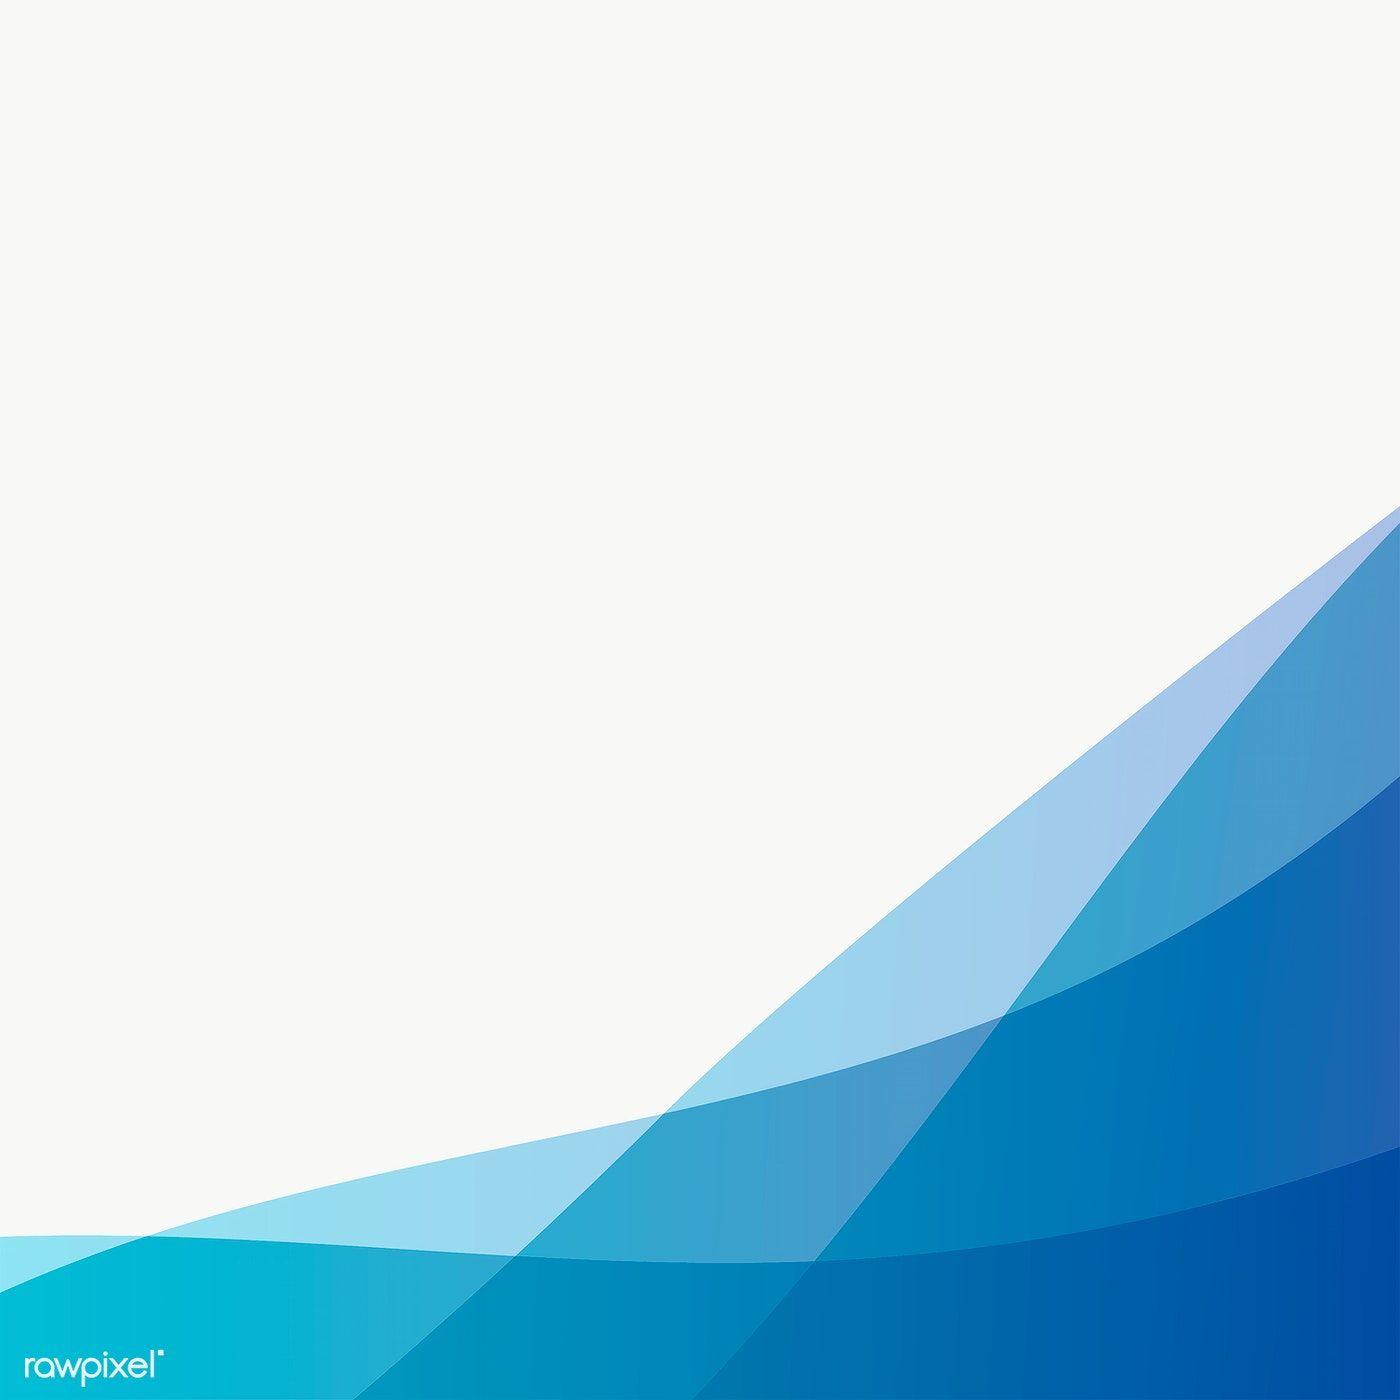 Blue Wave Textured Design Element Free Image By Rawpixel Com Busbus Texture Design Textured Waves Design Element